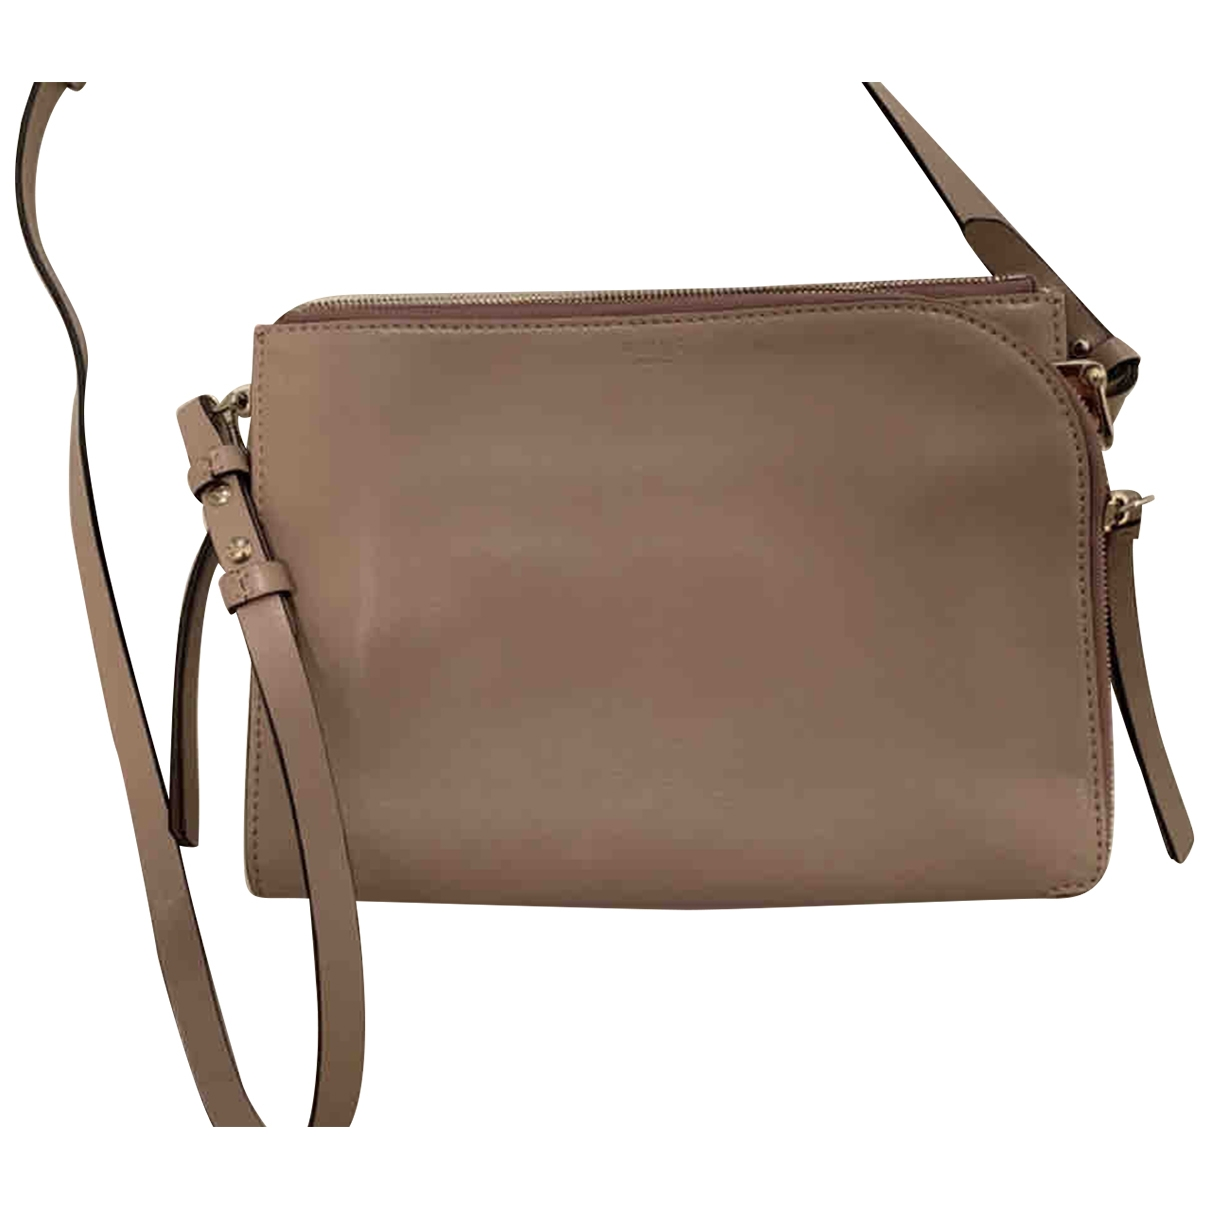 Reiss \N Pink Leather handbag for Women \N